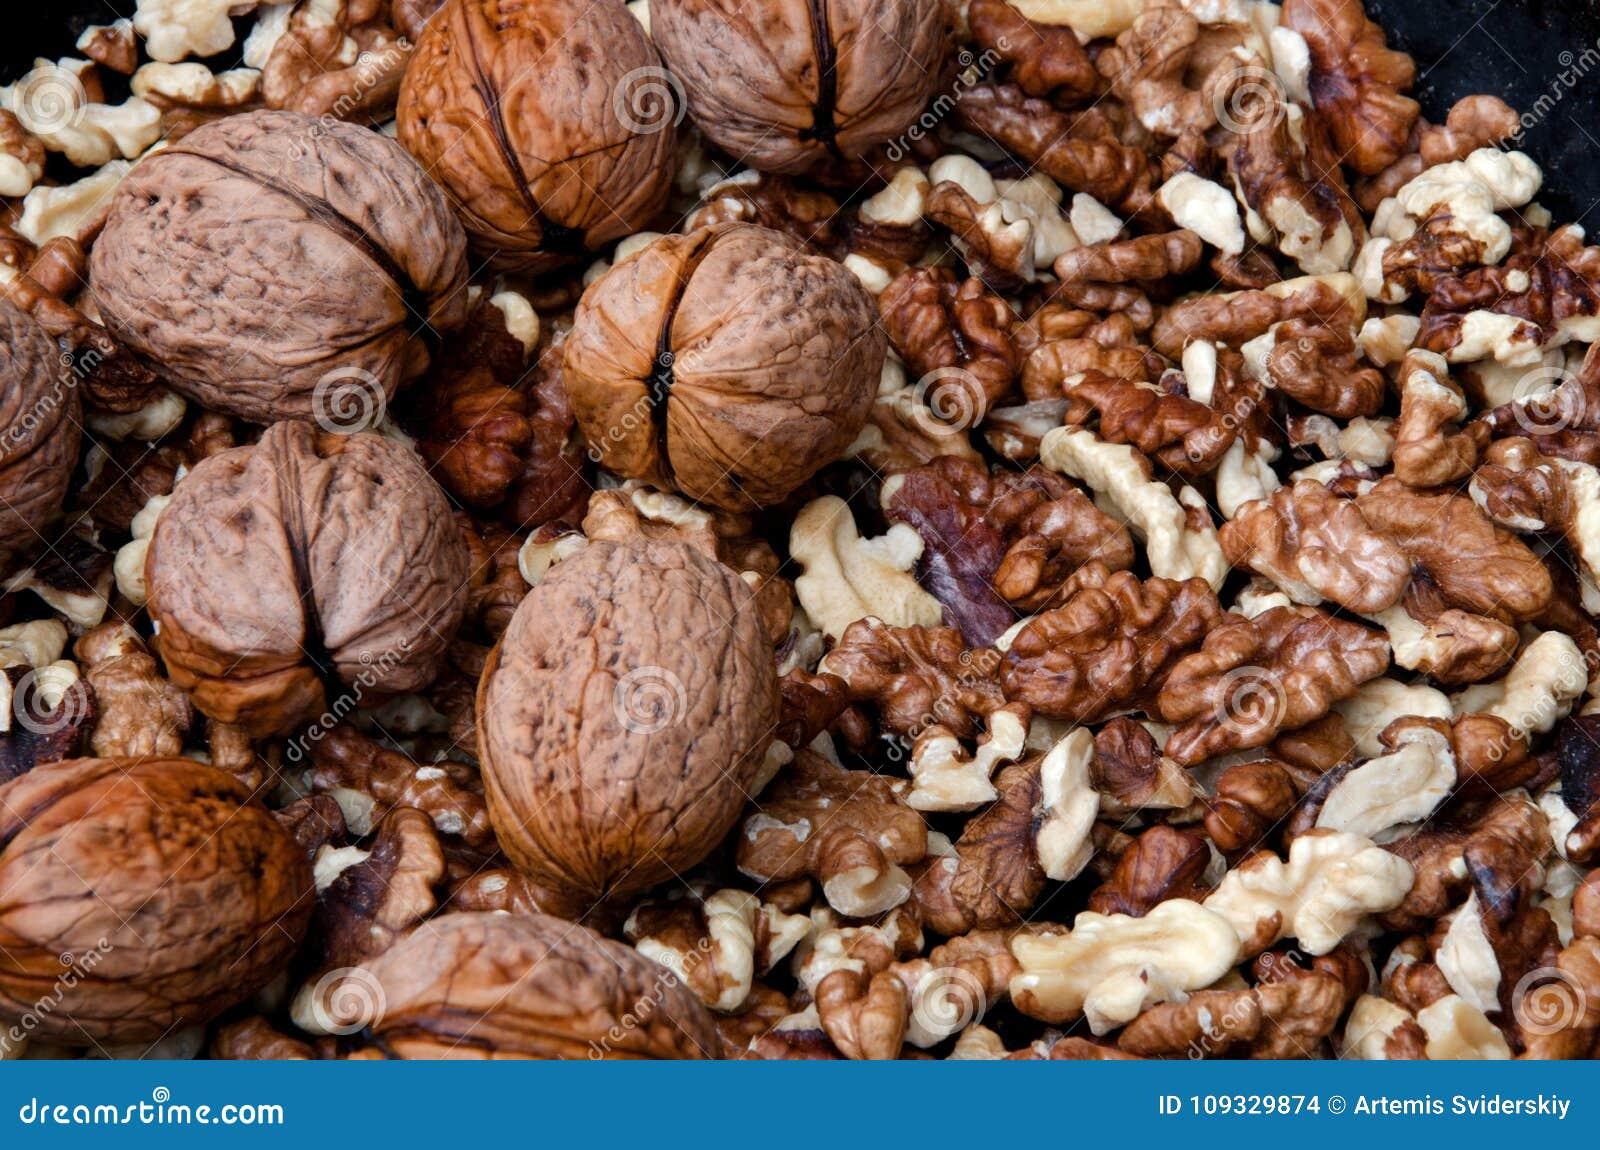 Inshell walnuts and peeled